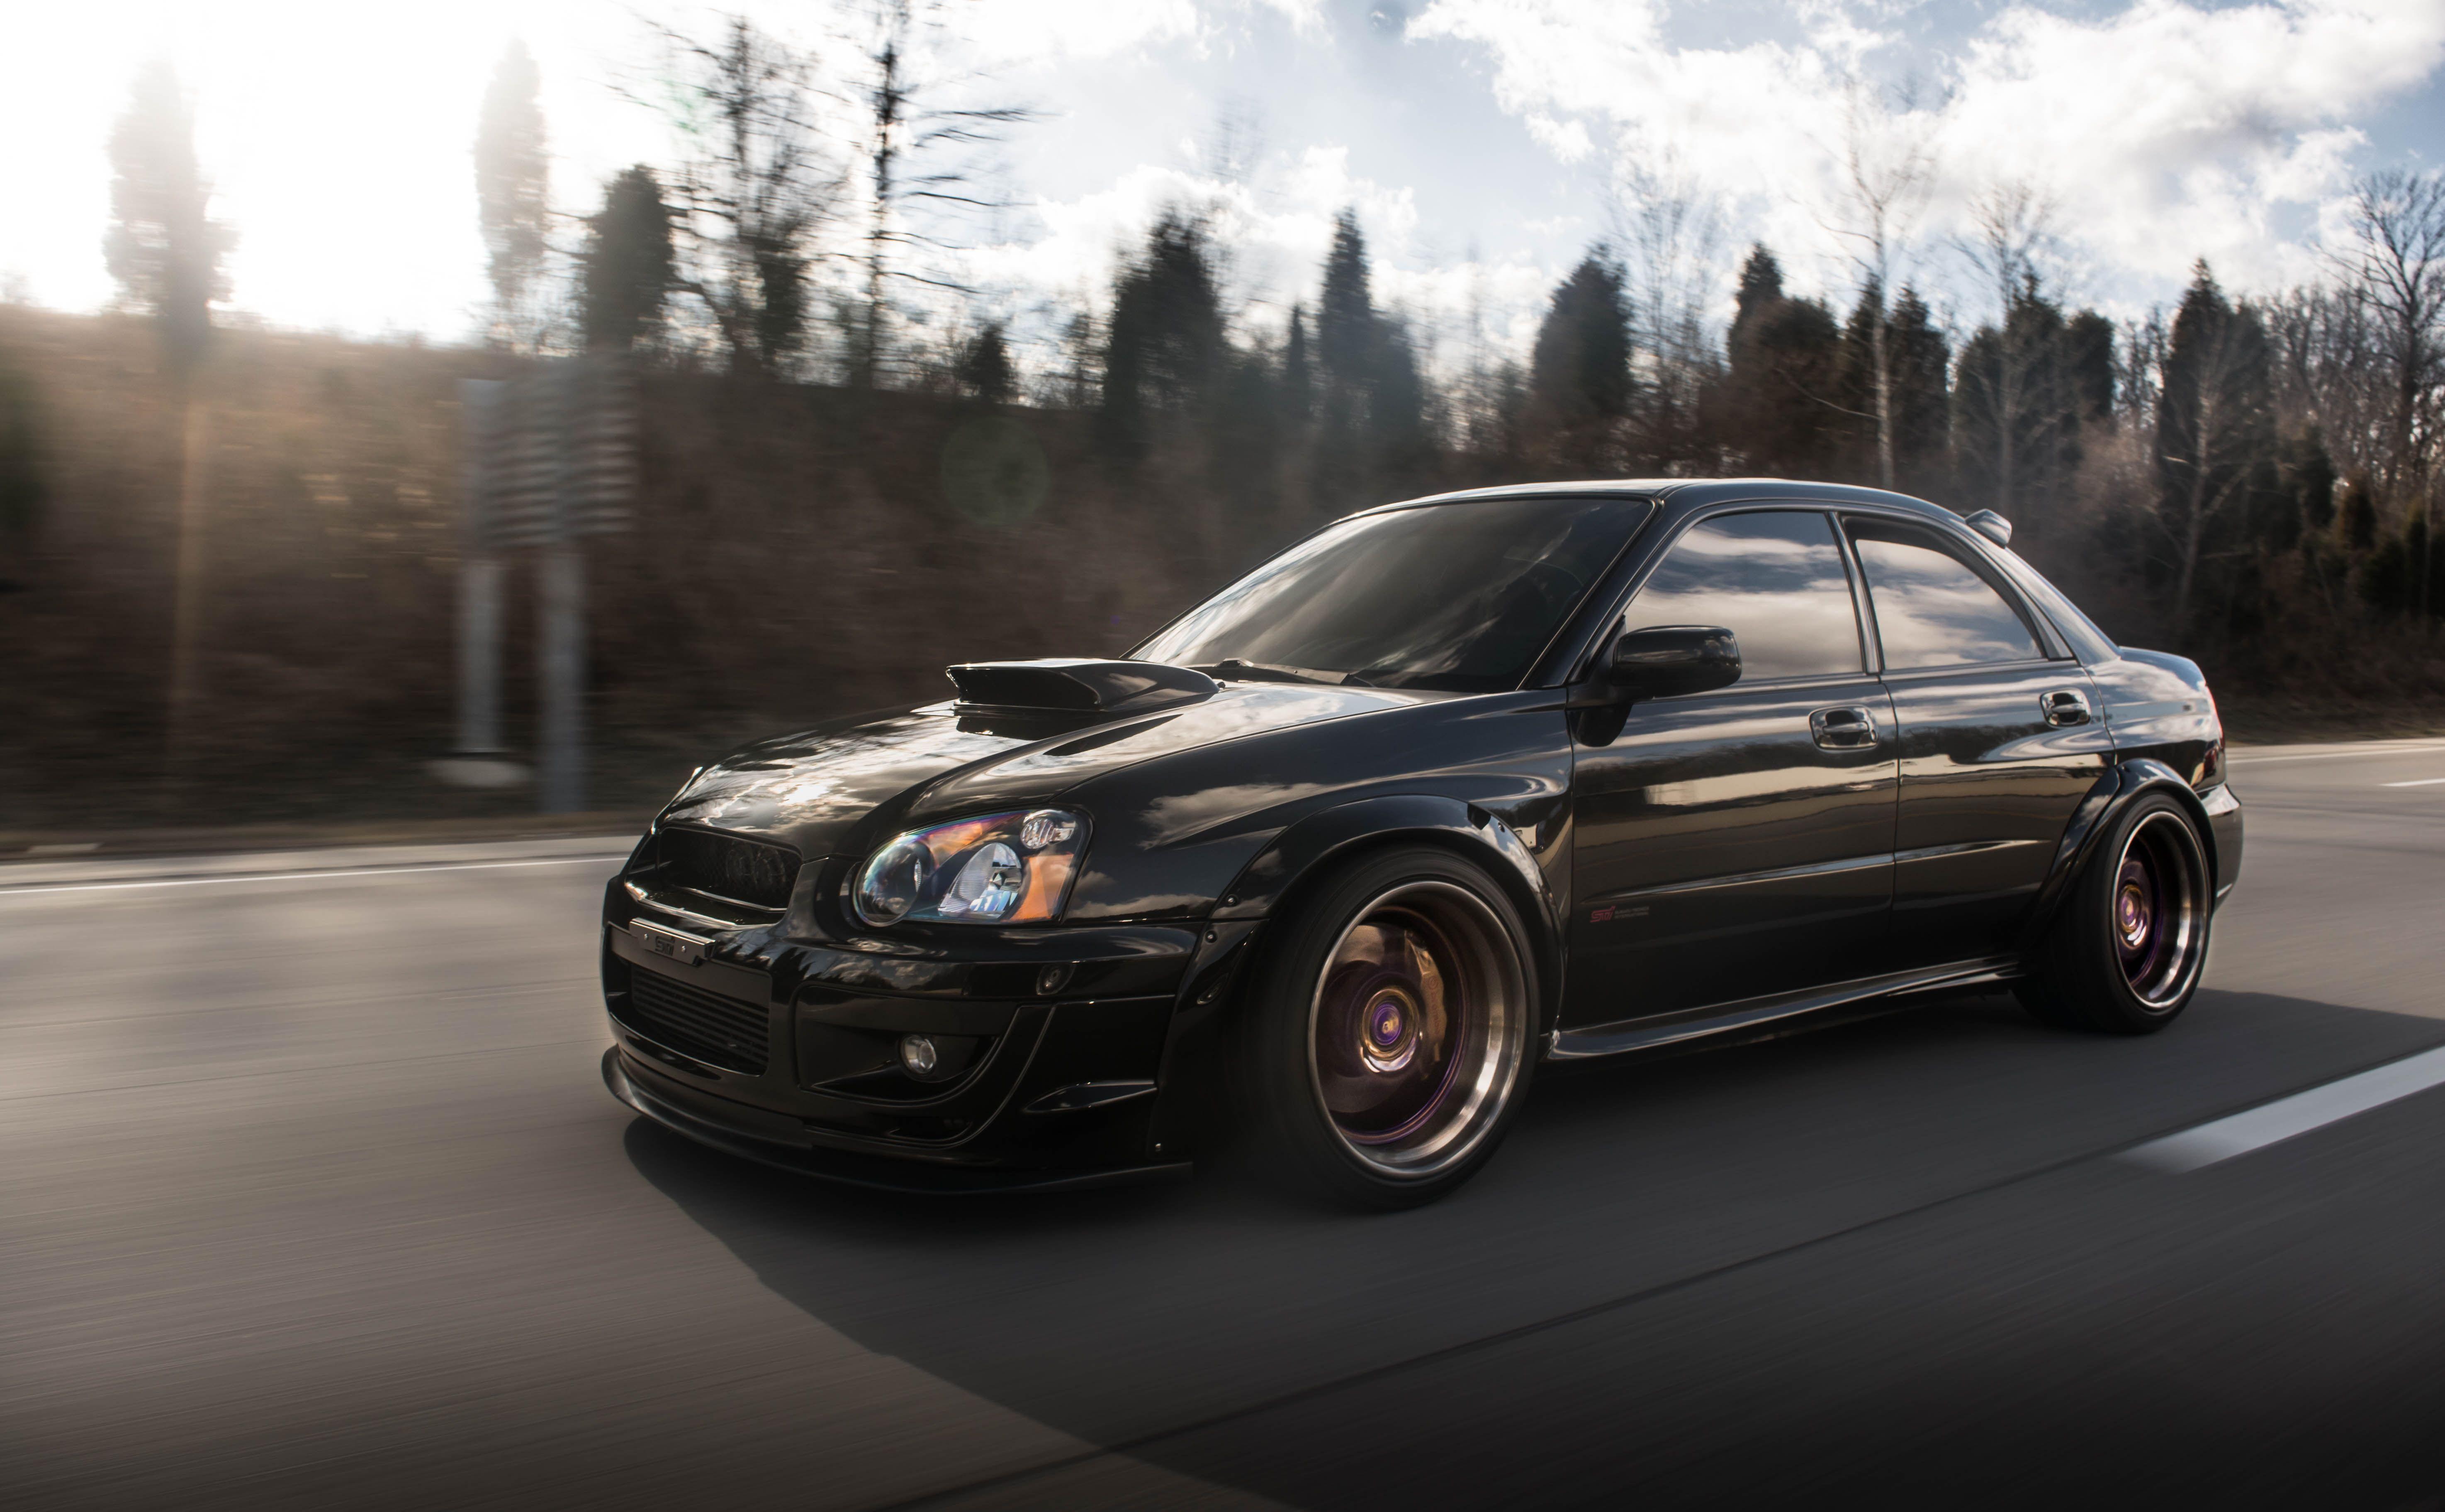 Subaru Impreza Subaru Impreza Wrx Sti Blobeye Black Car Grey Snow 5k Wallpaper Hdwallpaper Desktop Wrx Impreza Subaru Impreza Hd wallpaper subaru black car road